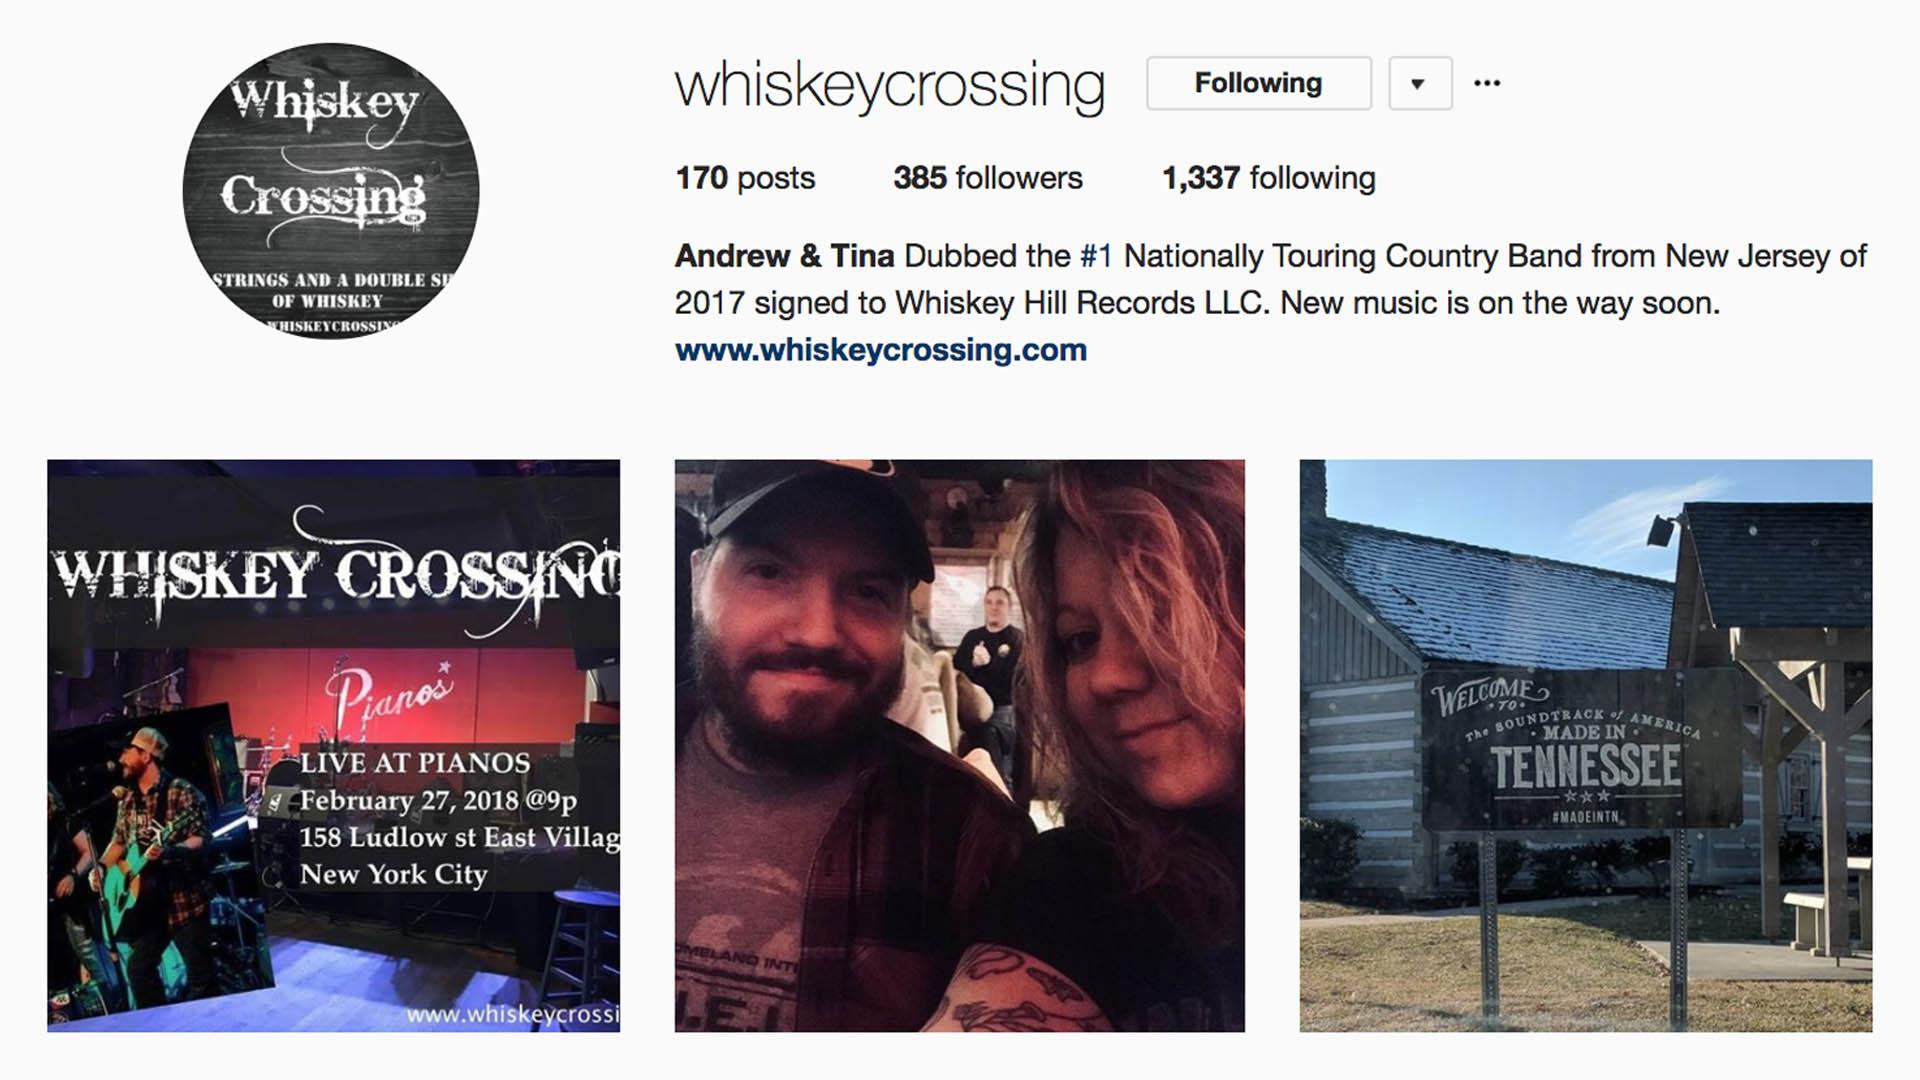 instagram.com/whiskeycrossing